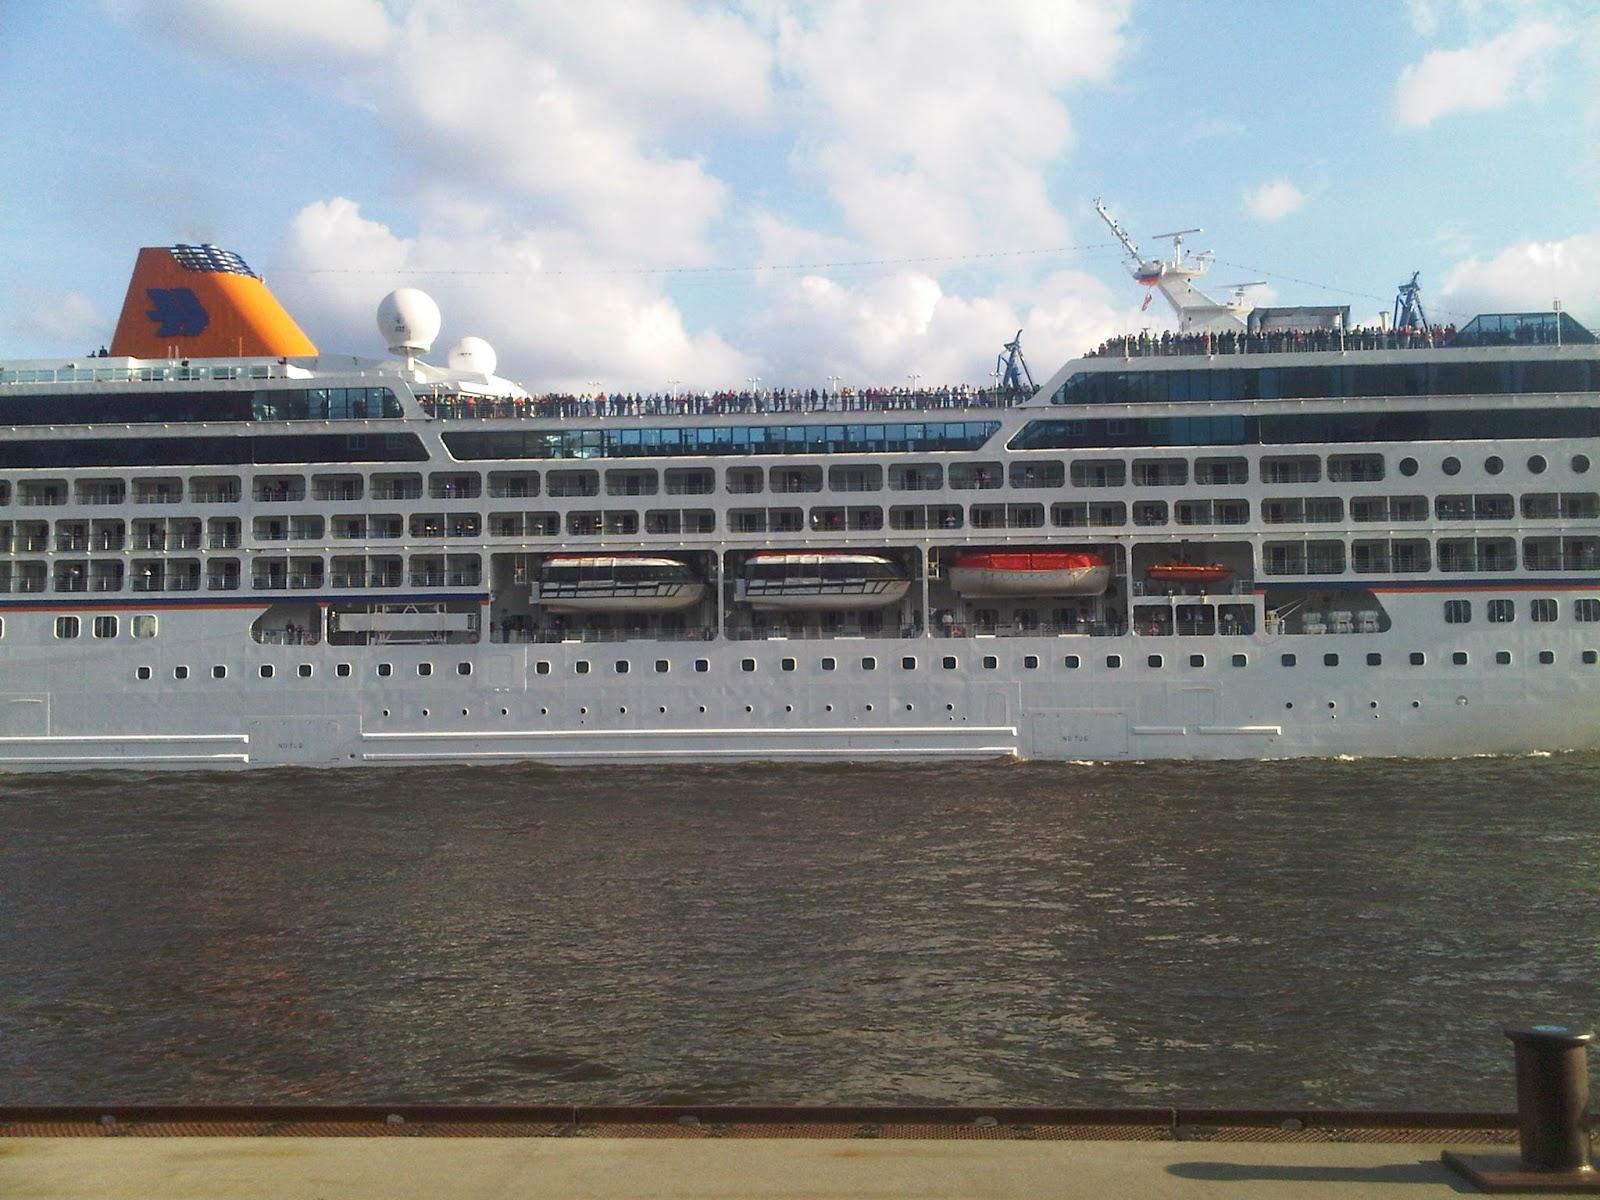 Columbus 2 verlässt den Hamburger Hafen.